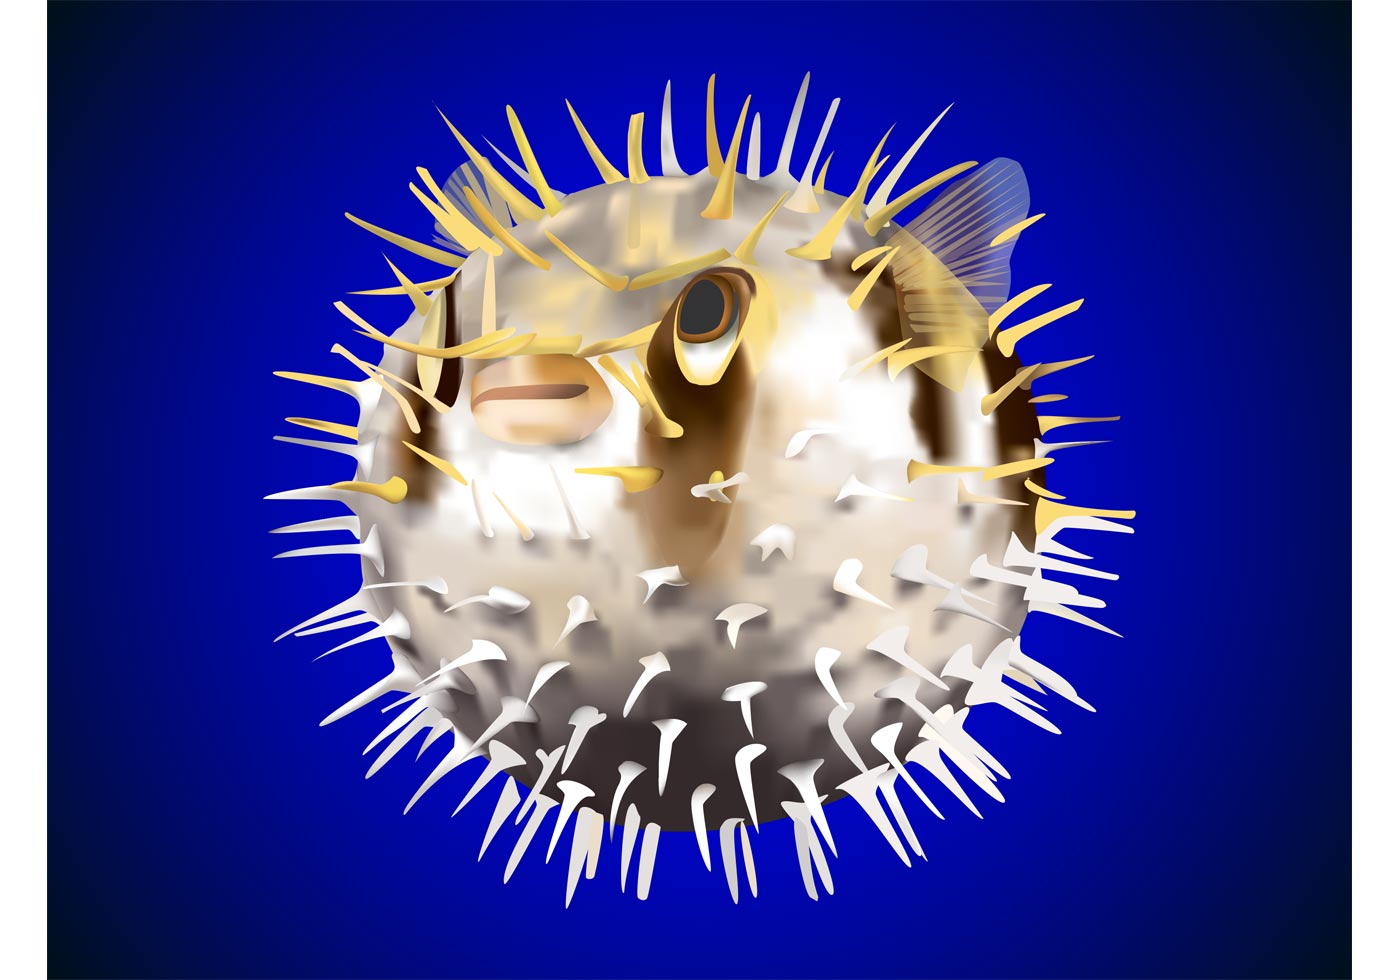 Puffer Fish Vector - Download Free Vector Art, Stock ...